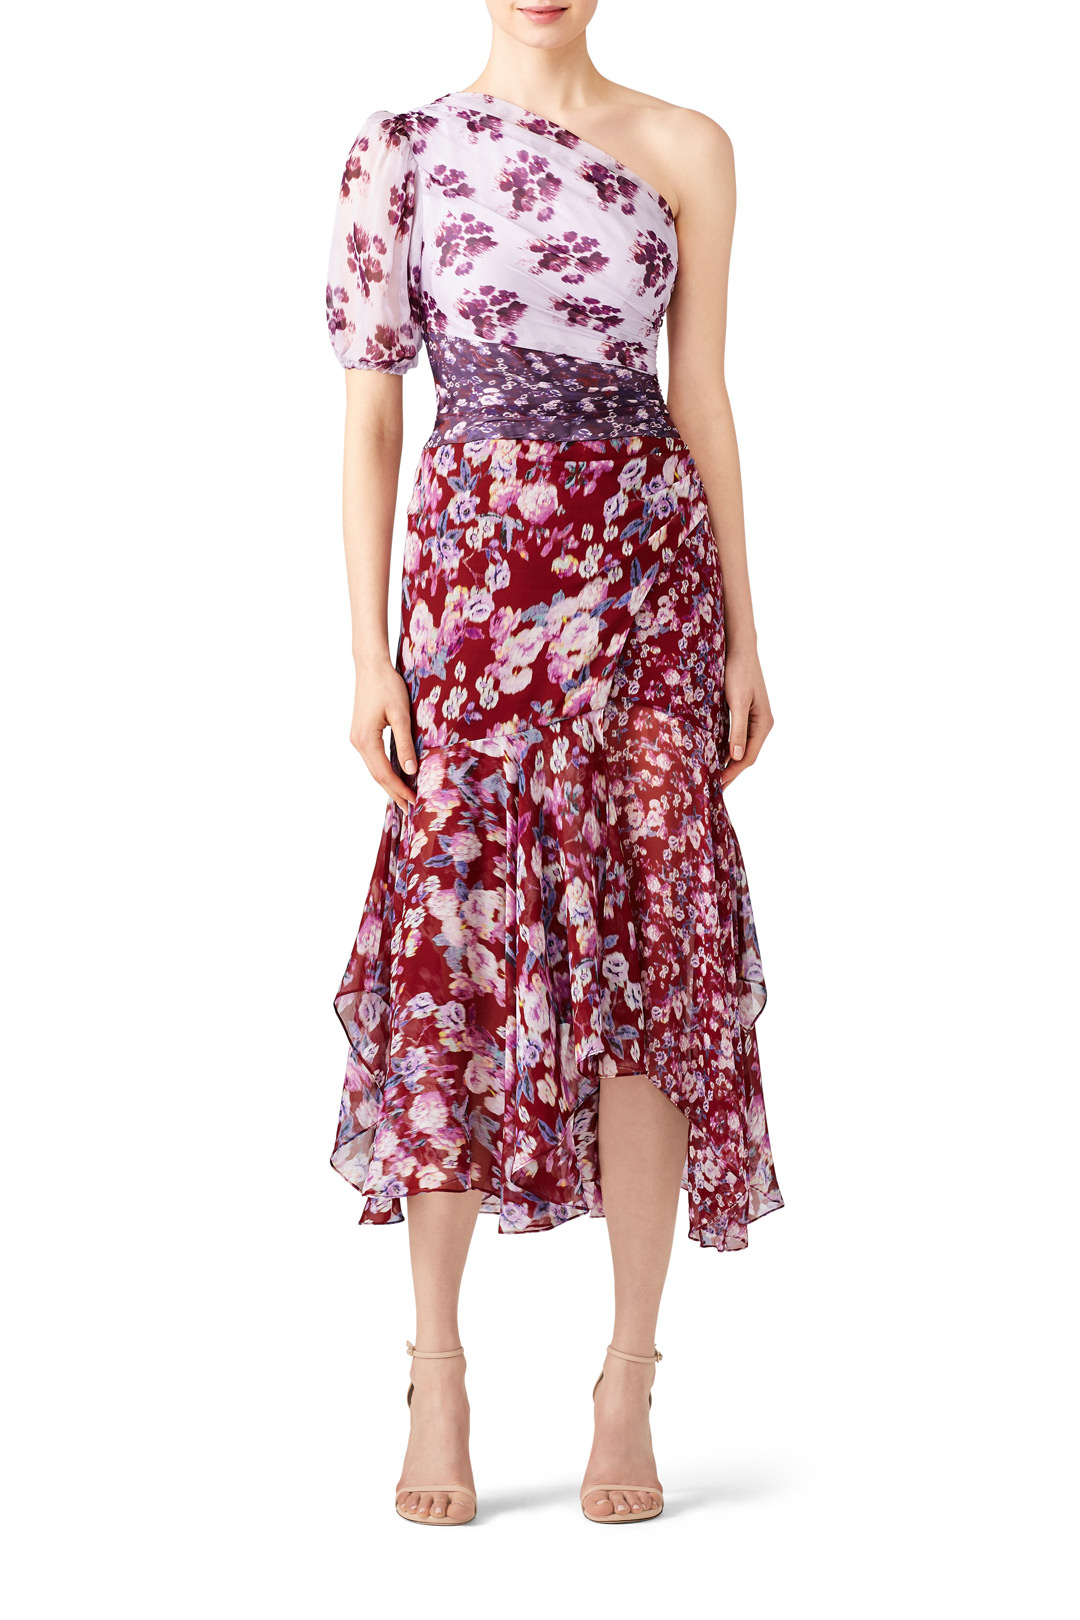 RTR - Amur Laura Dress.jpg